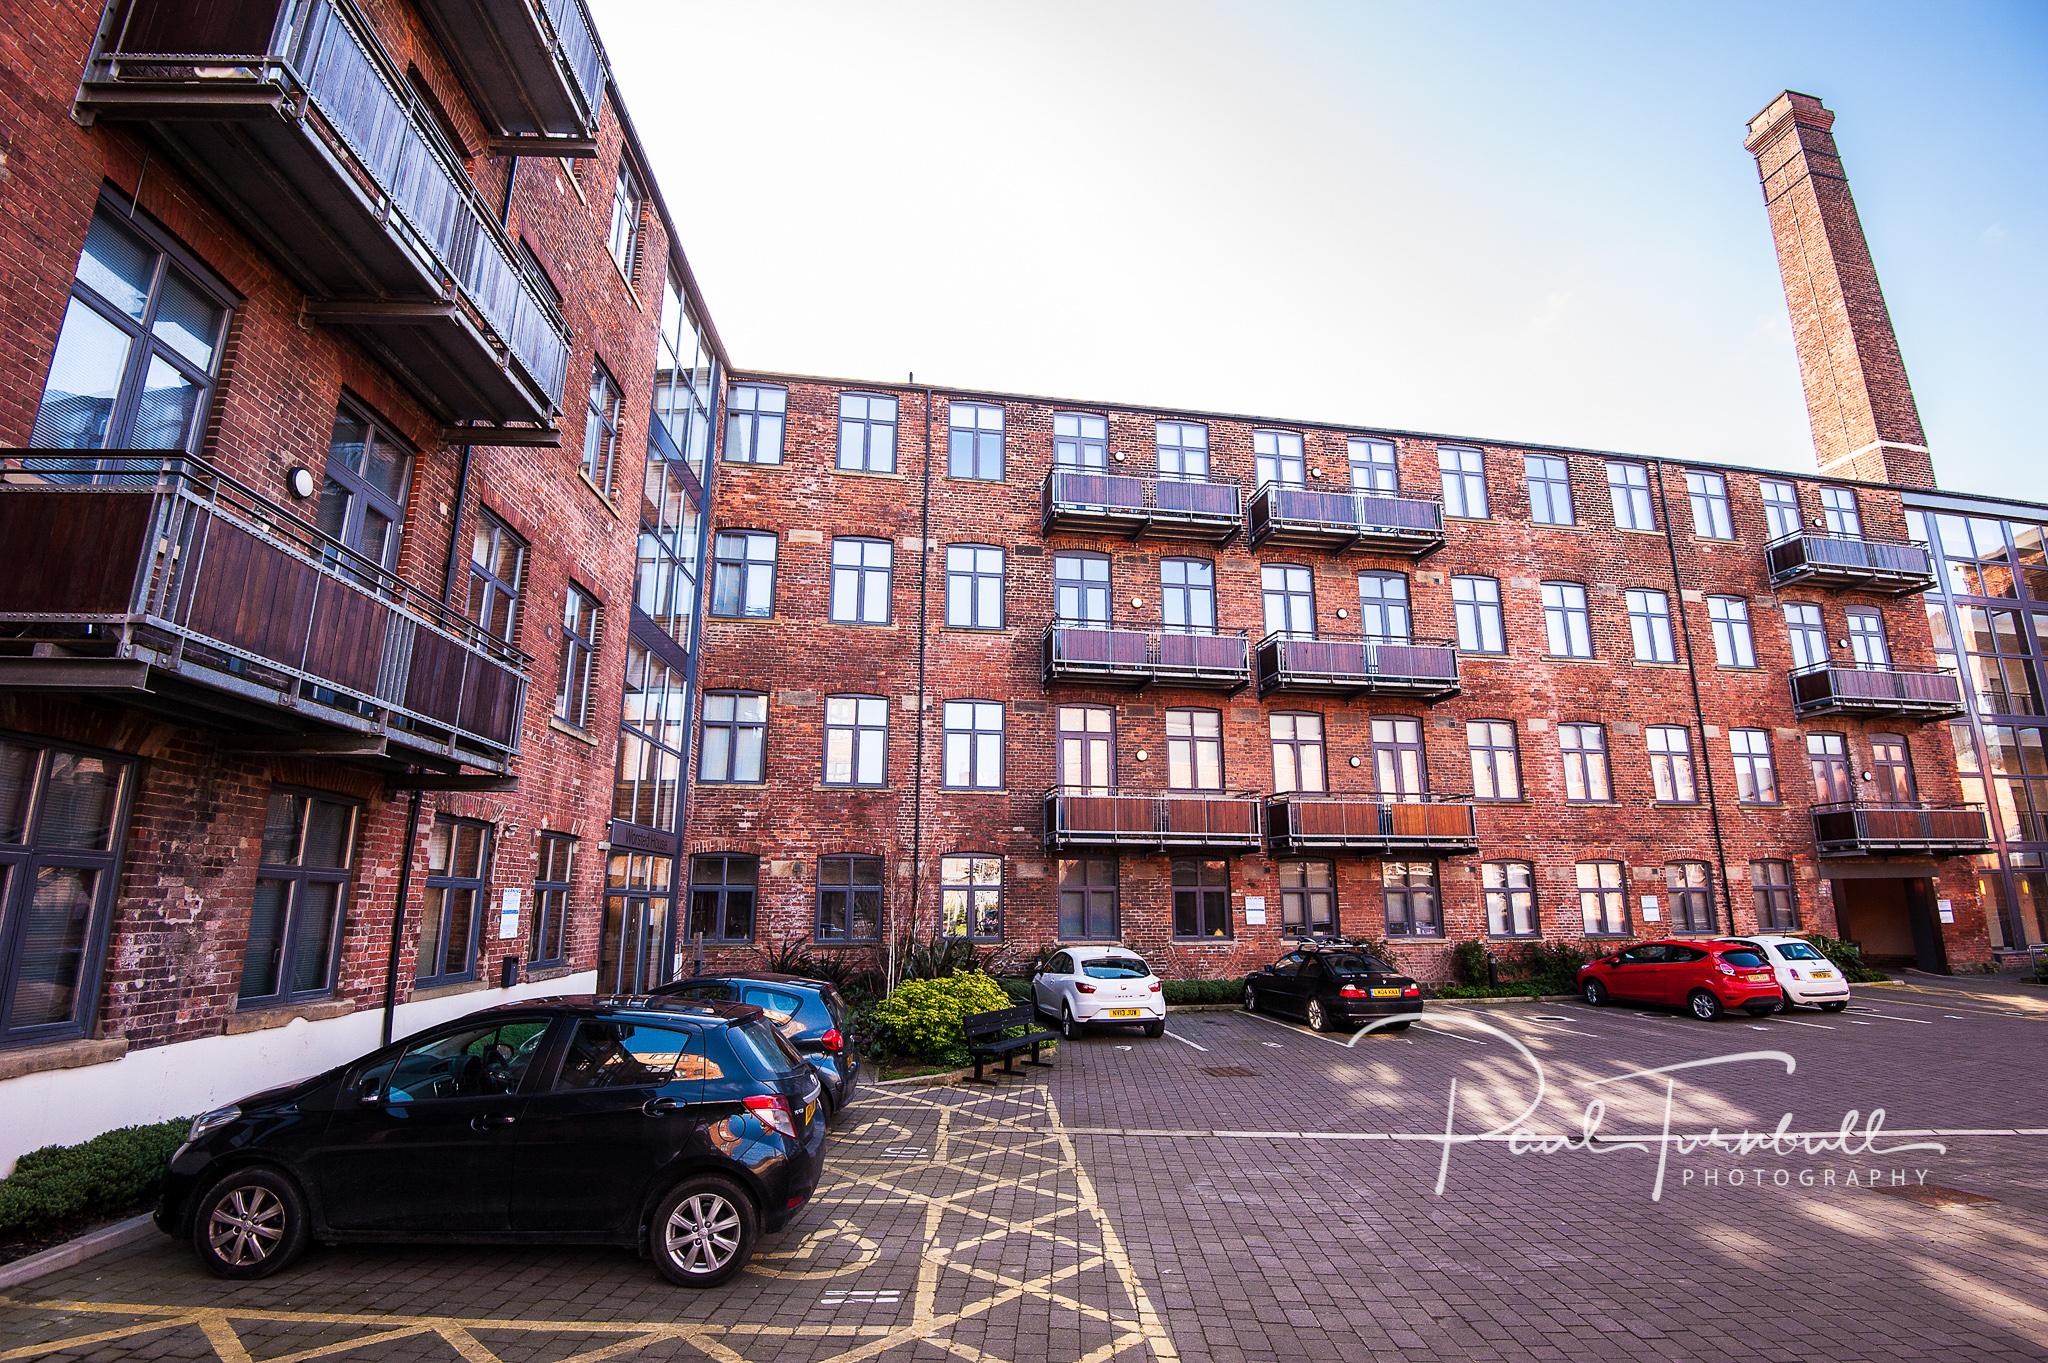 commercial-property-photographer-leeds-yorkshire-blackbrook-developments-007.jpg